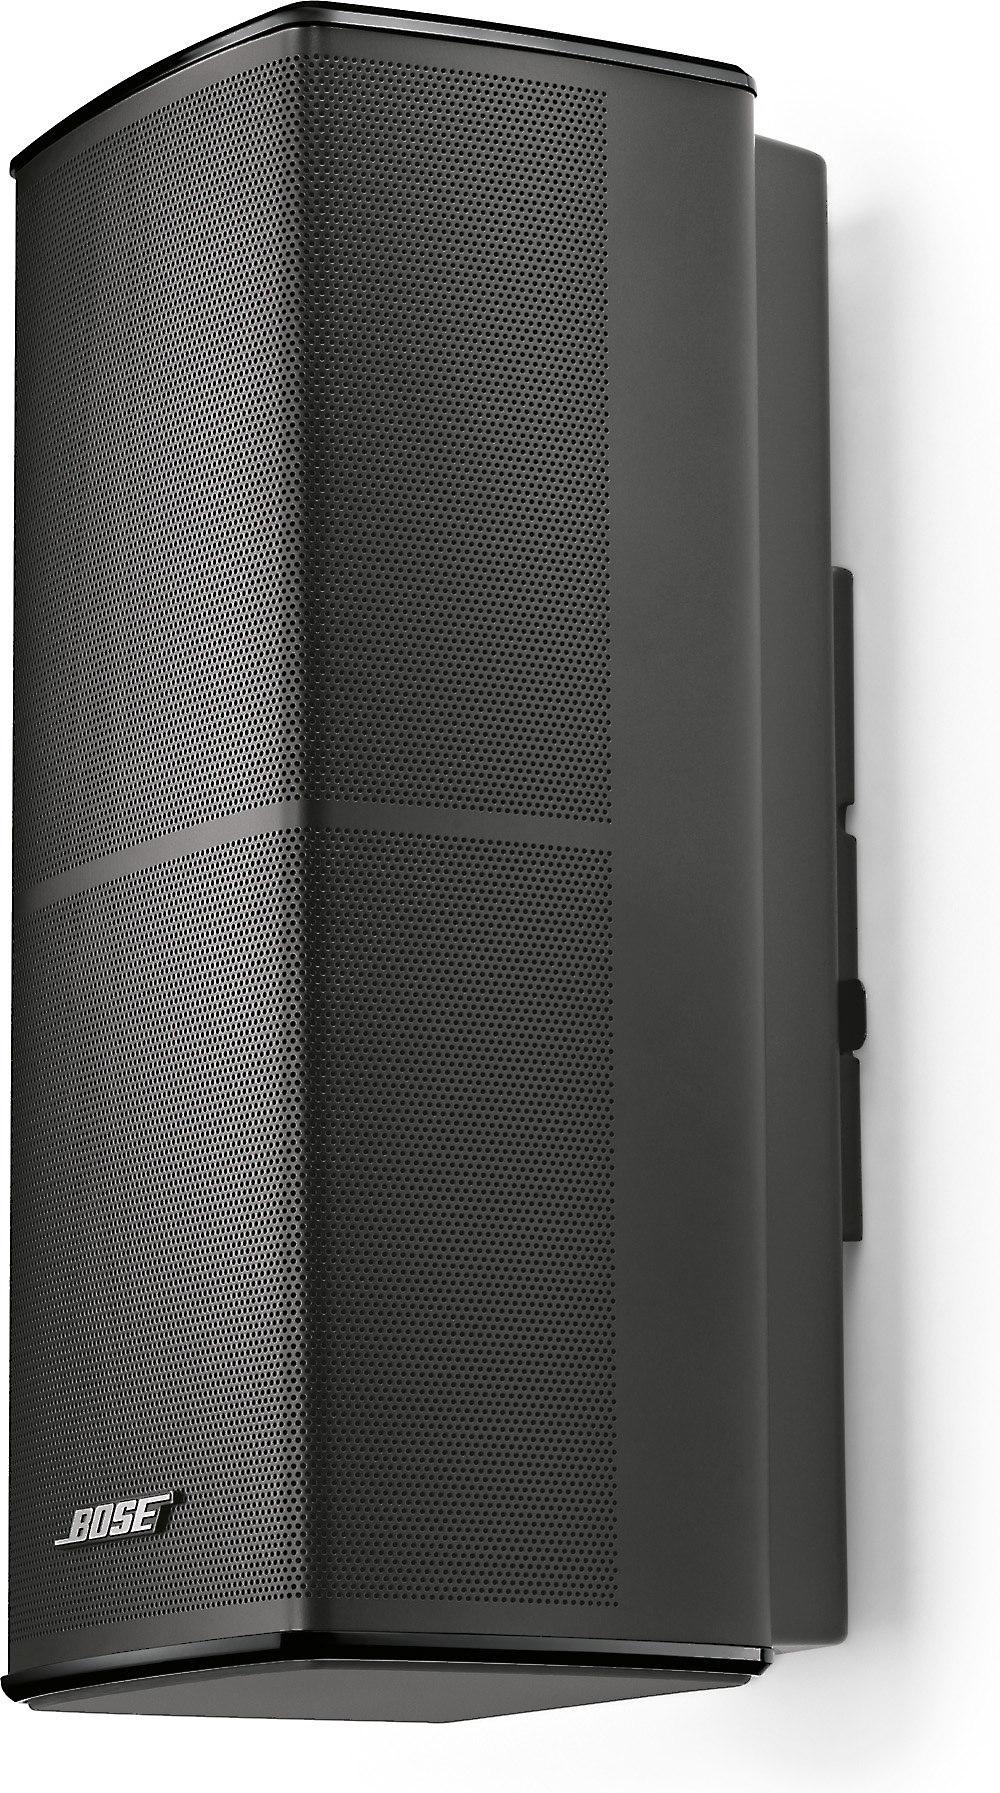 Bose Slideconnect Wb 50 Wall Bracket Black At Crutchfield